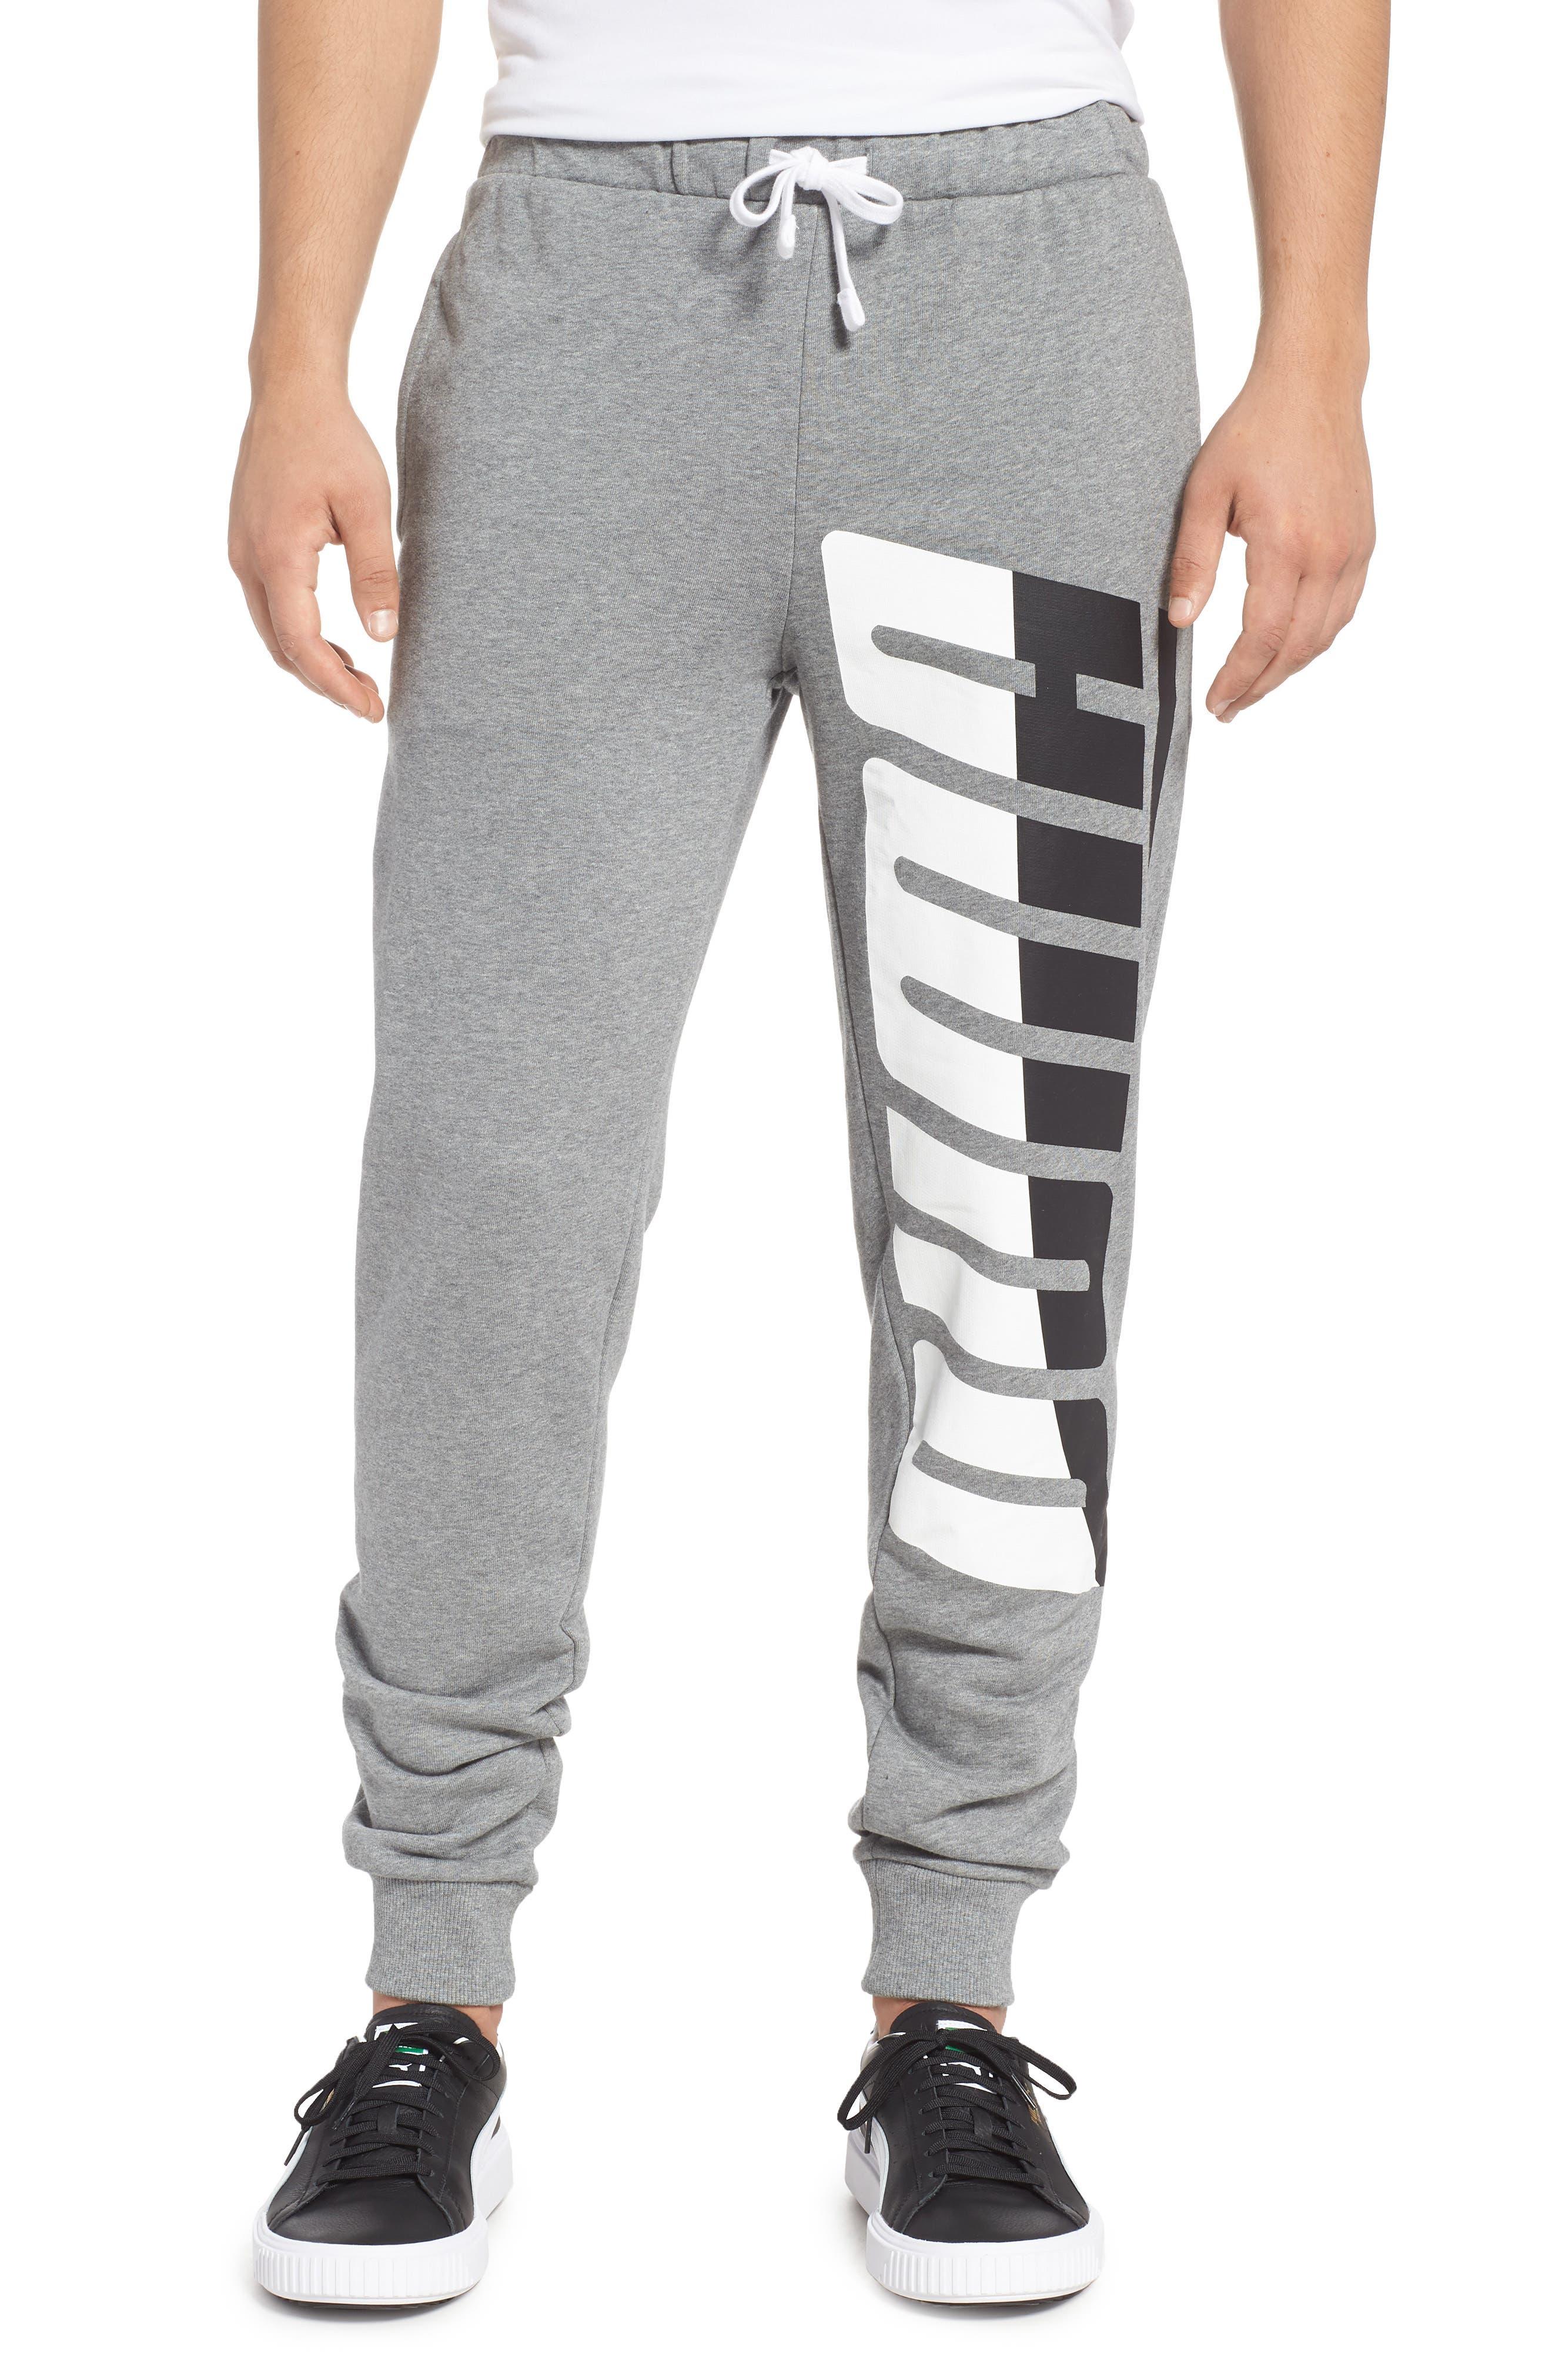 Loud Pack Cotton Sweatpants,                         Main,                         color, MEDIUM GRAY HEATHER